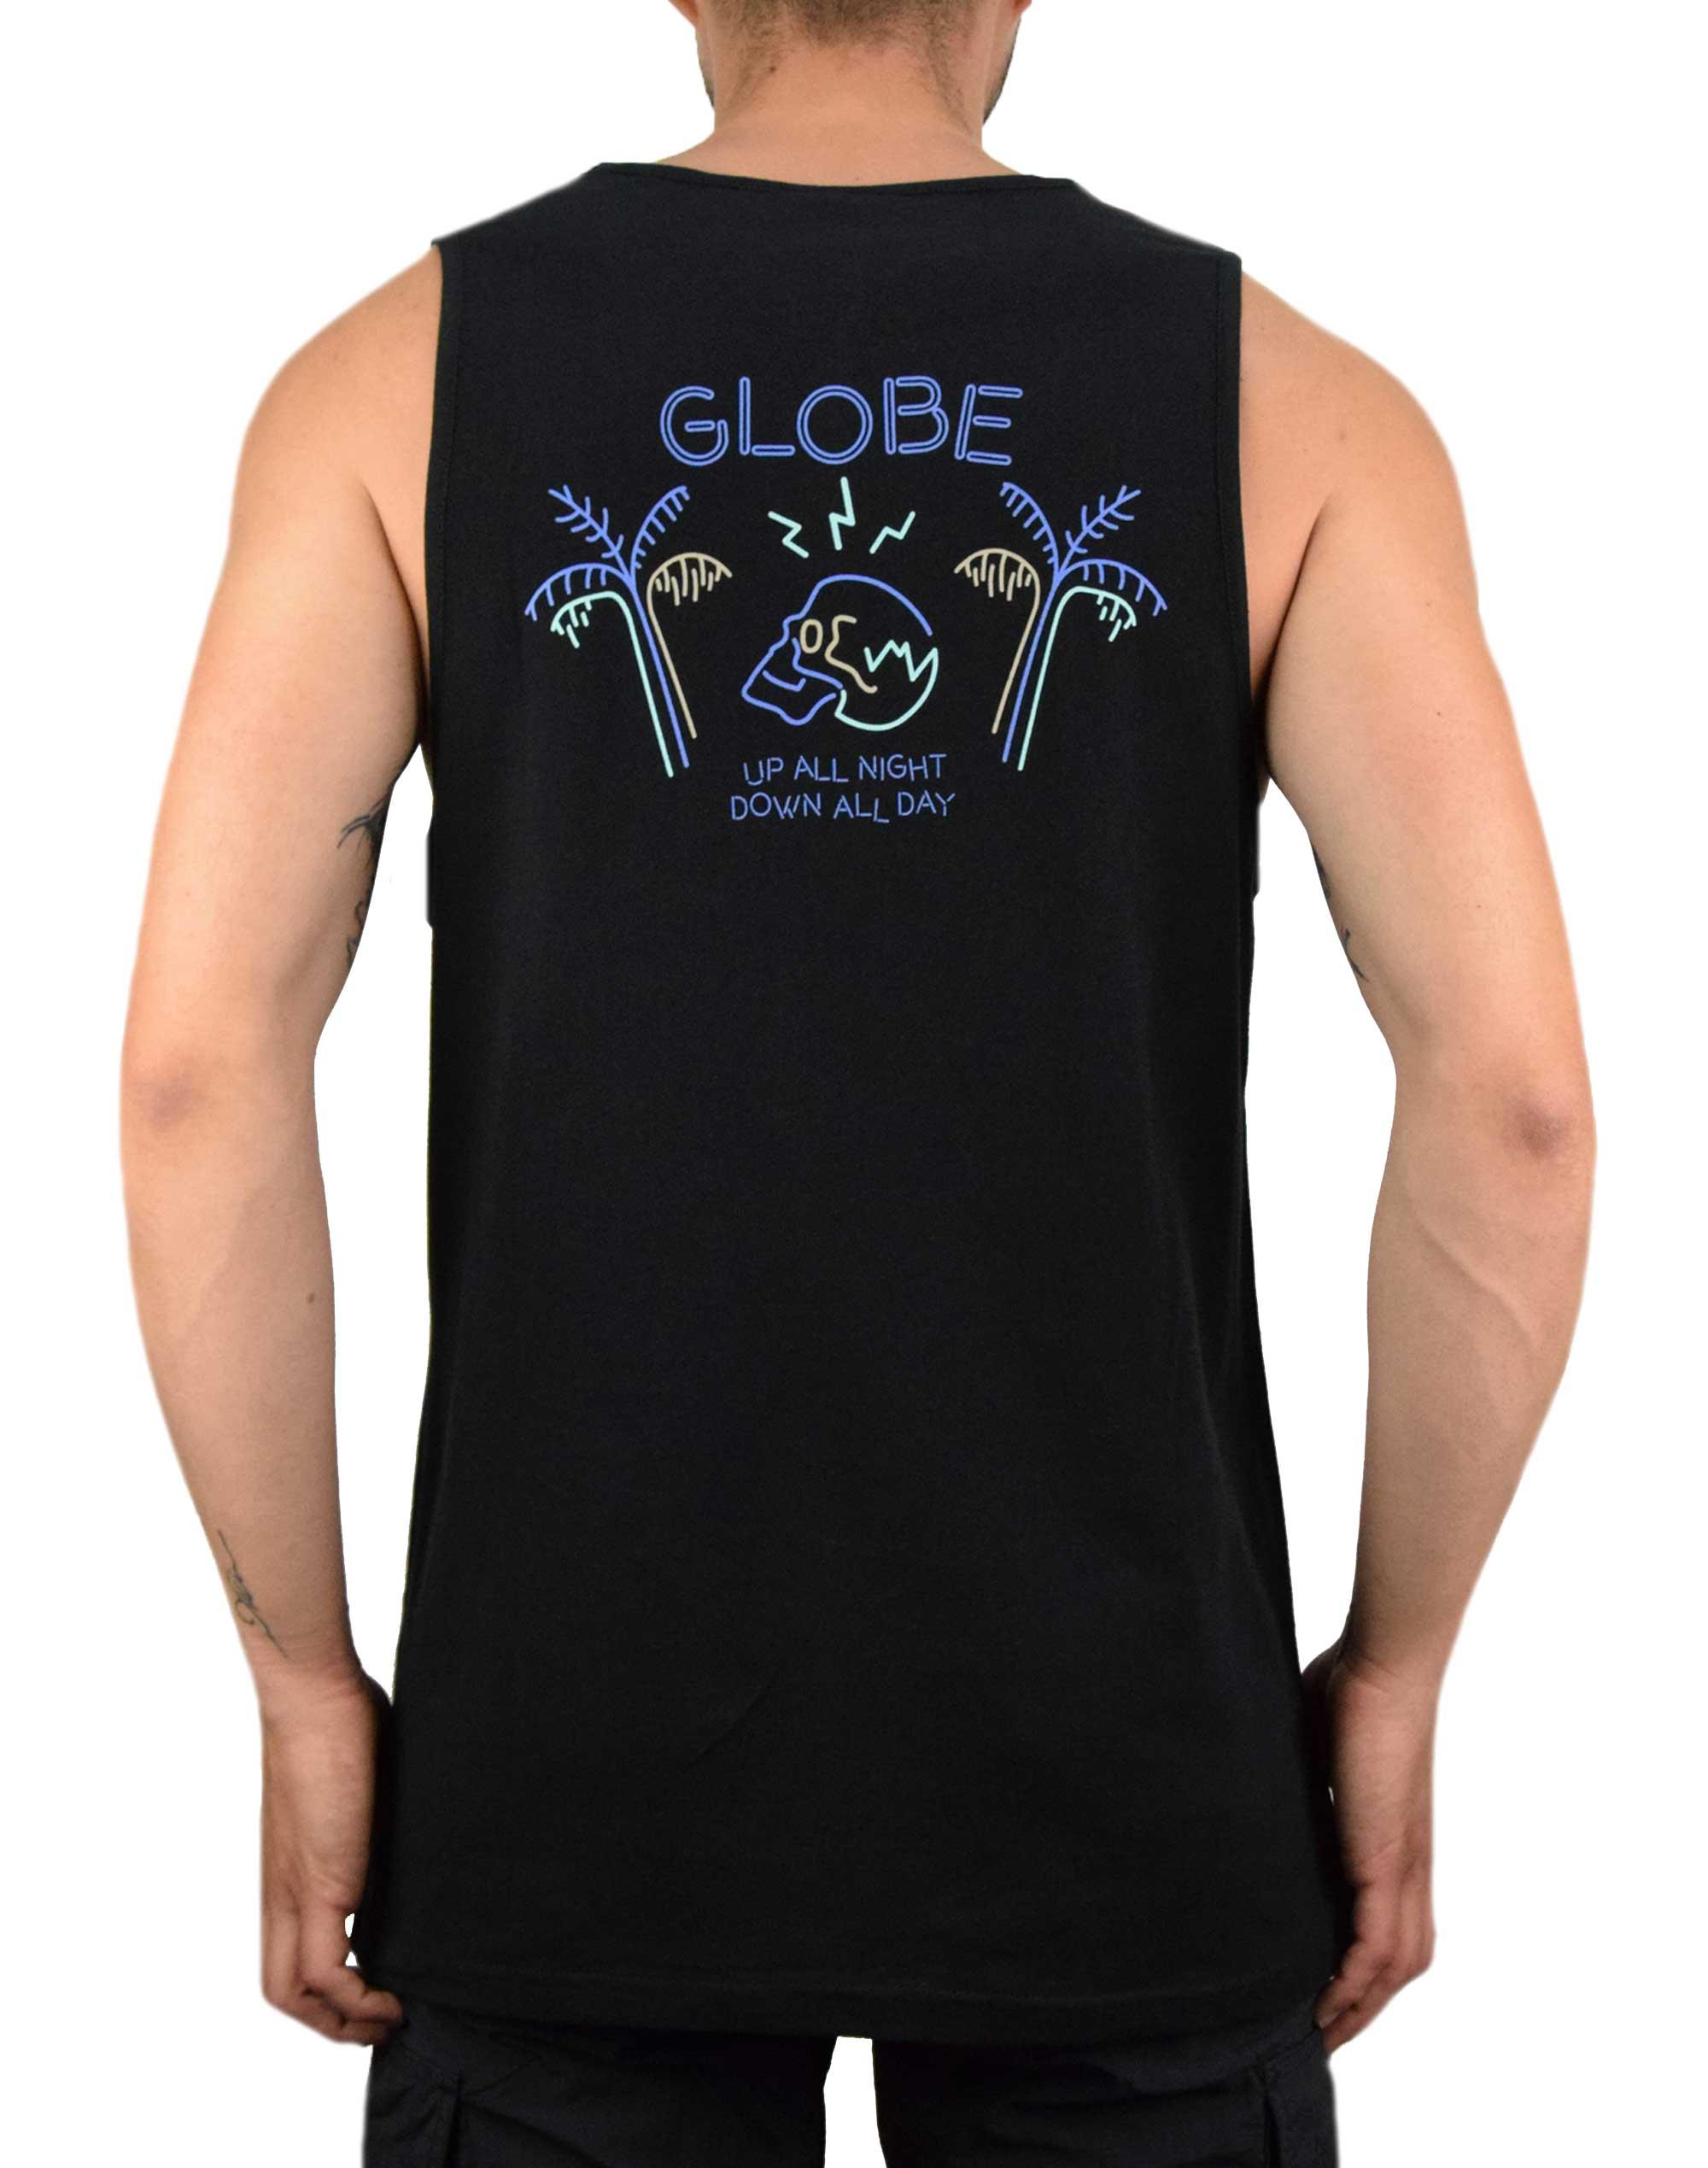 Globe Neon Dreams Singlet Tee (GB01912003) Black